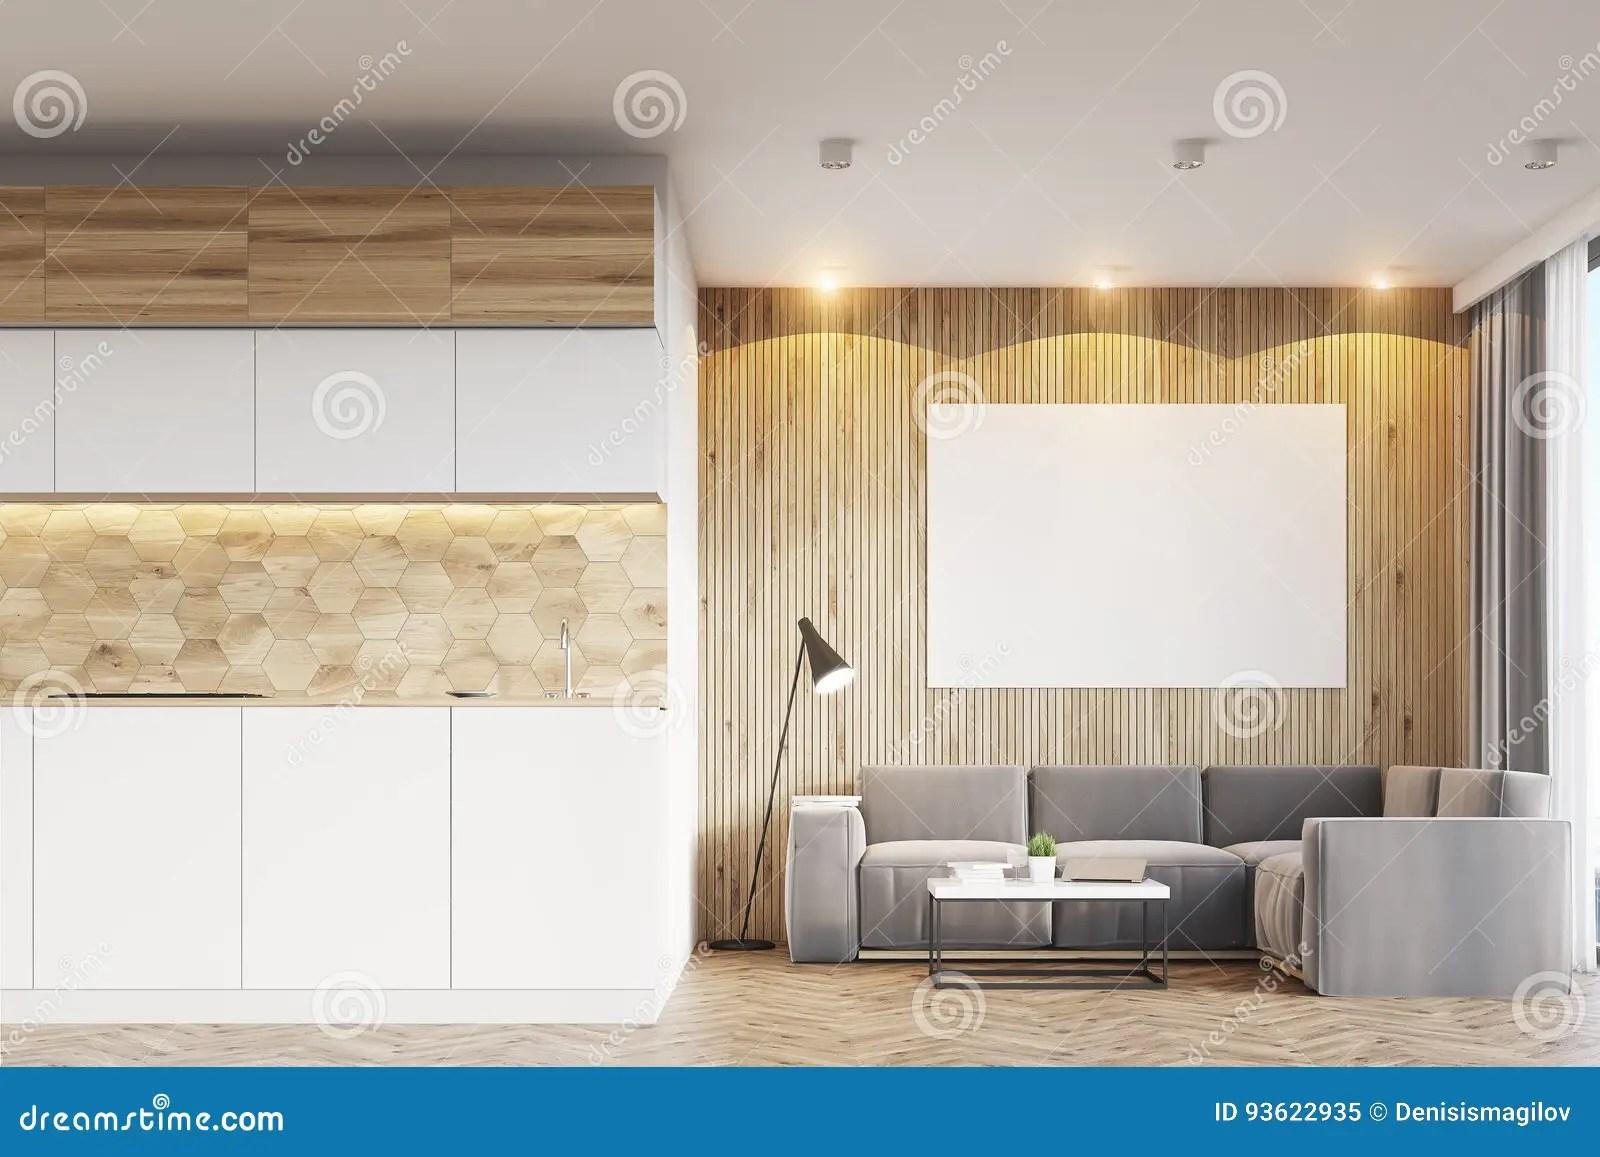 framed prints for kitchens new kitchen designs 轻的木客厅和厨房库存图片 图片包括有海报 纸张 内部 闪亮指示 装饰 与轻的木墙壁的客厅内部 与一个灰色沙发的左边的相反一个厨房和有一张水平的海报的一把扶手椅子在墙壁